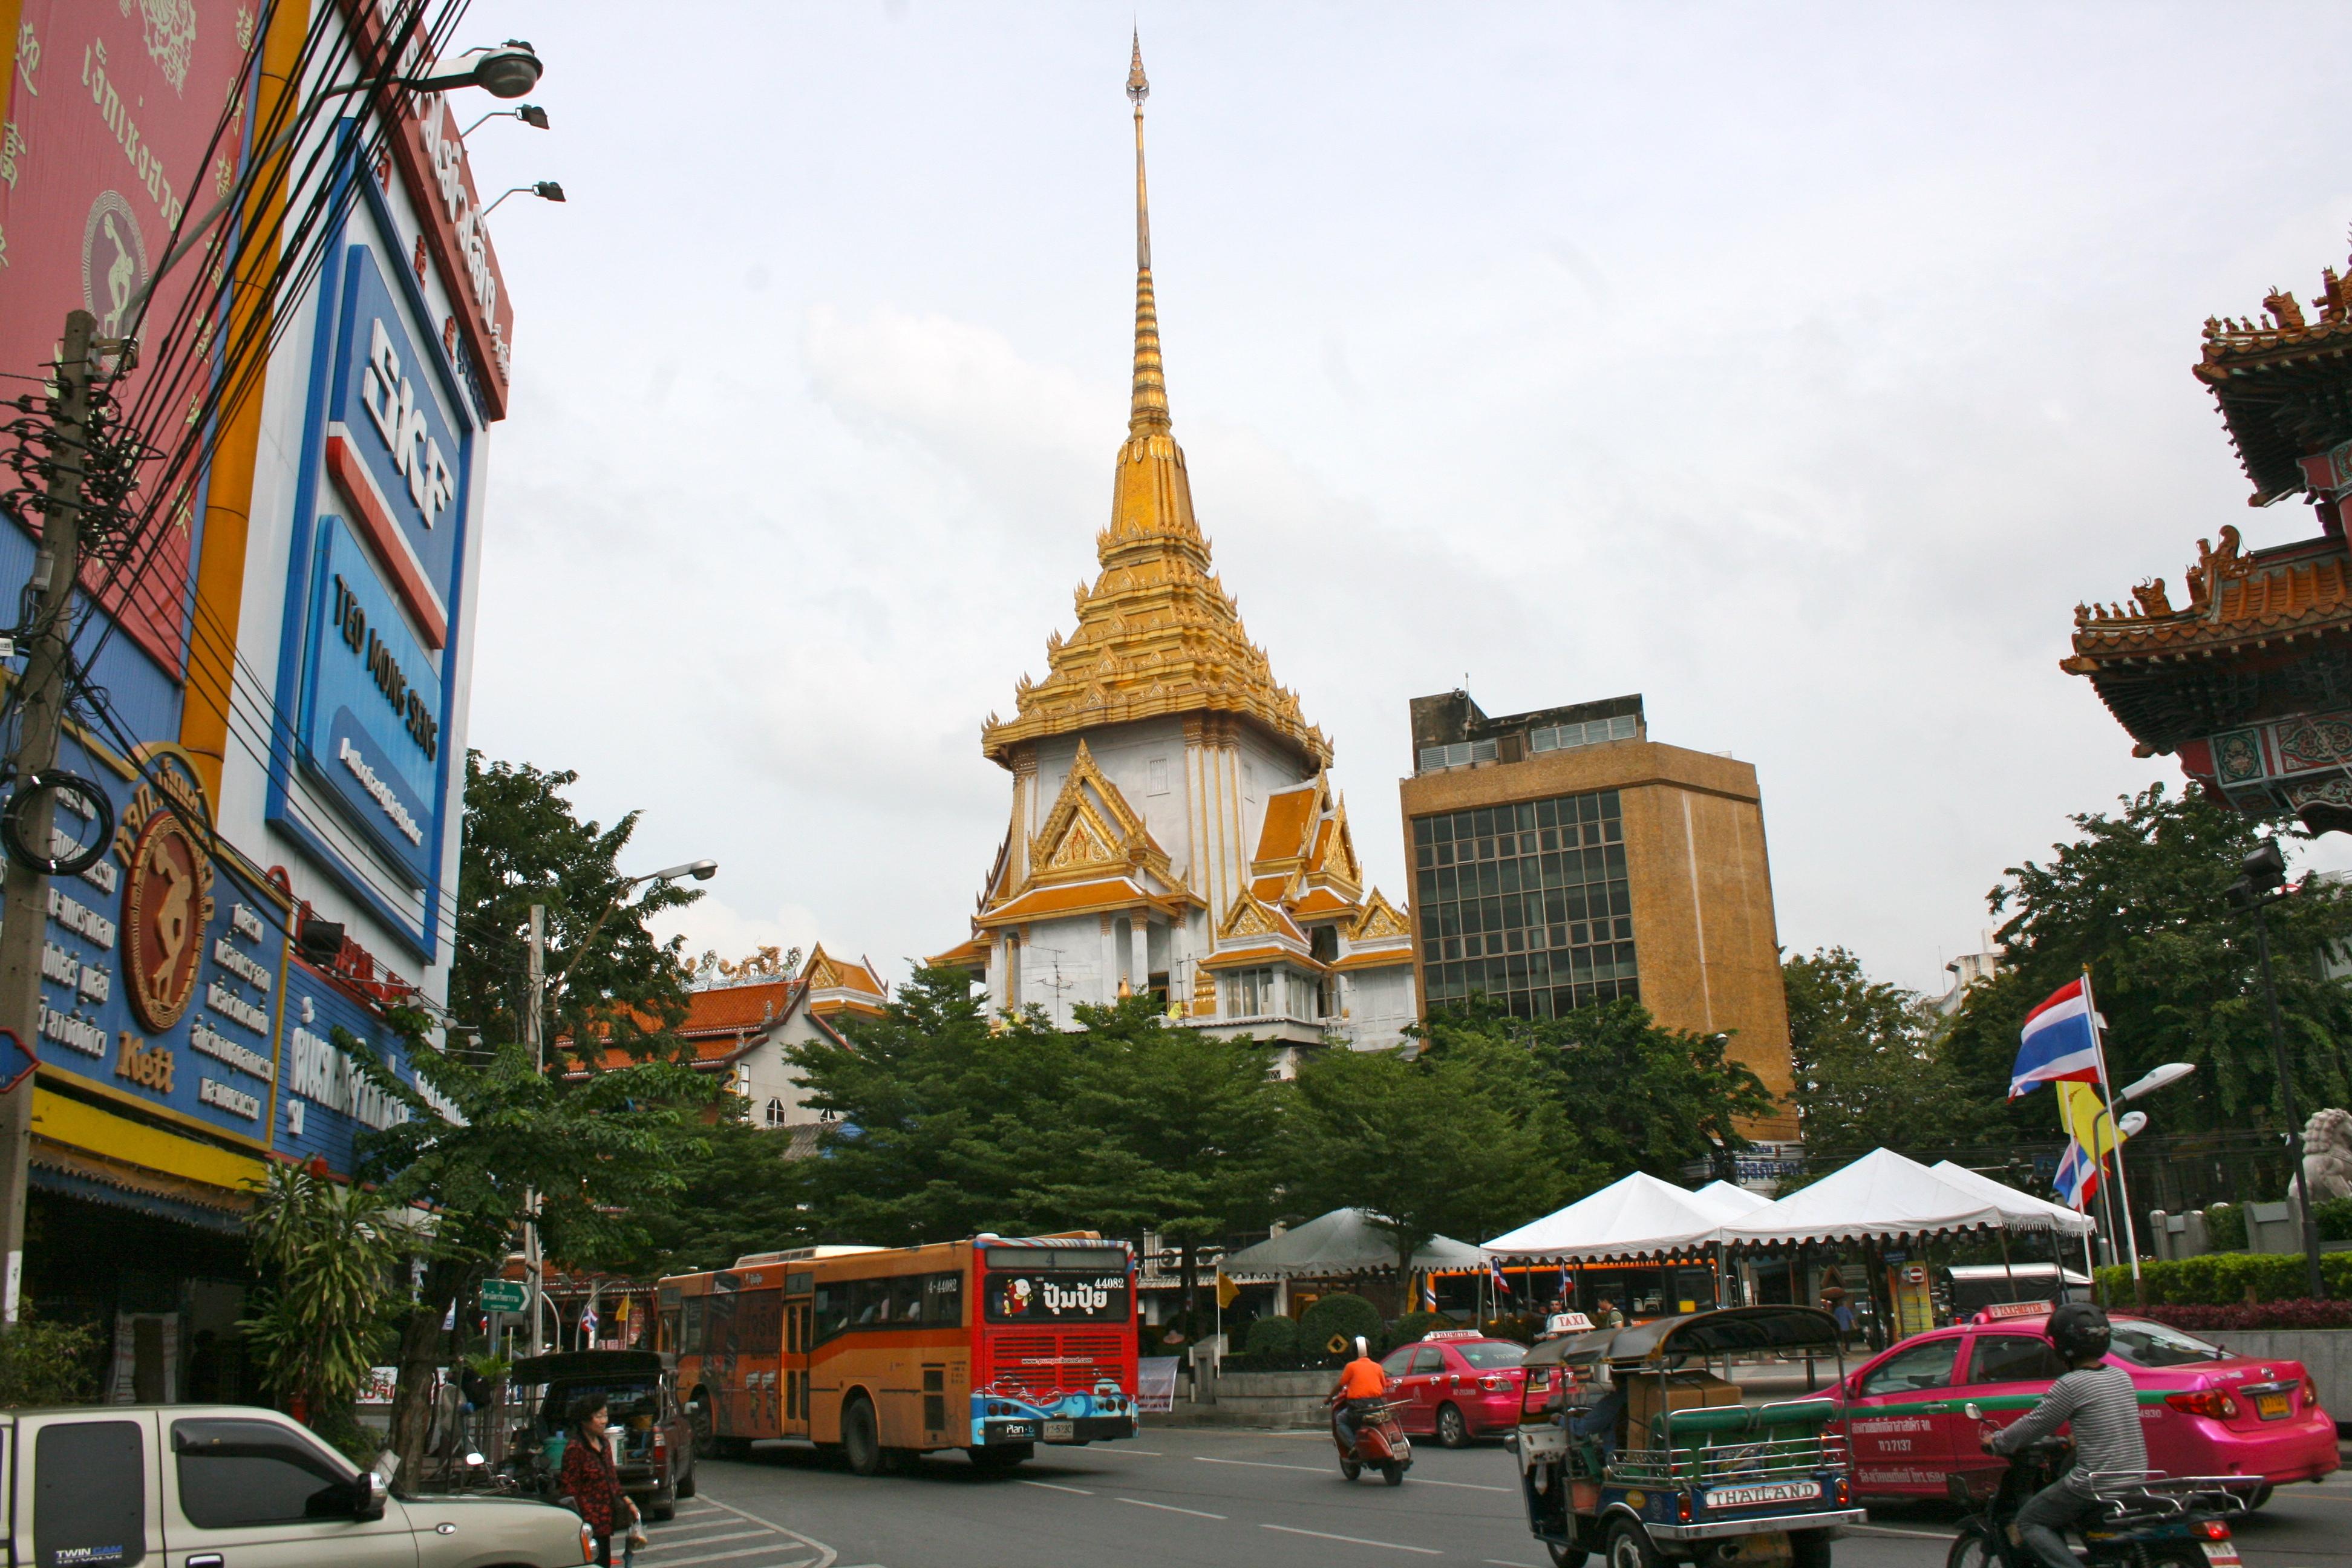 File:Wat Traimit, The Temple of the Golden Buddha (8271109826).jpg - Wikimedi...